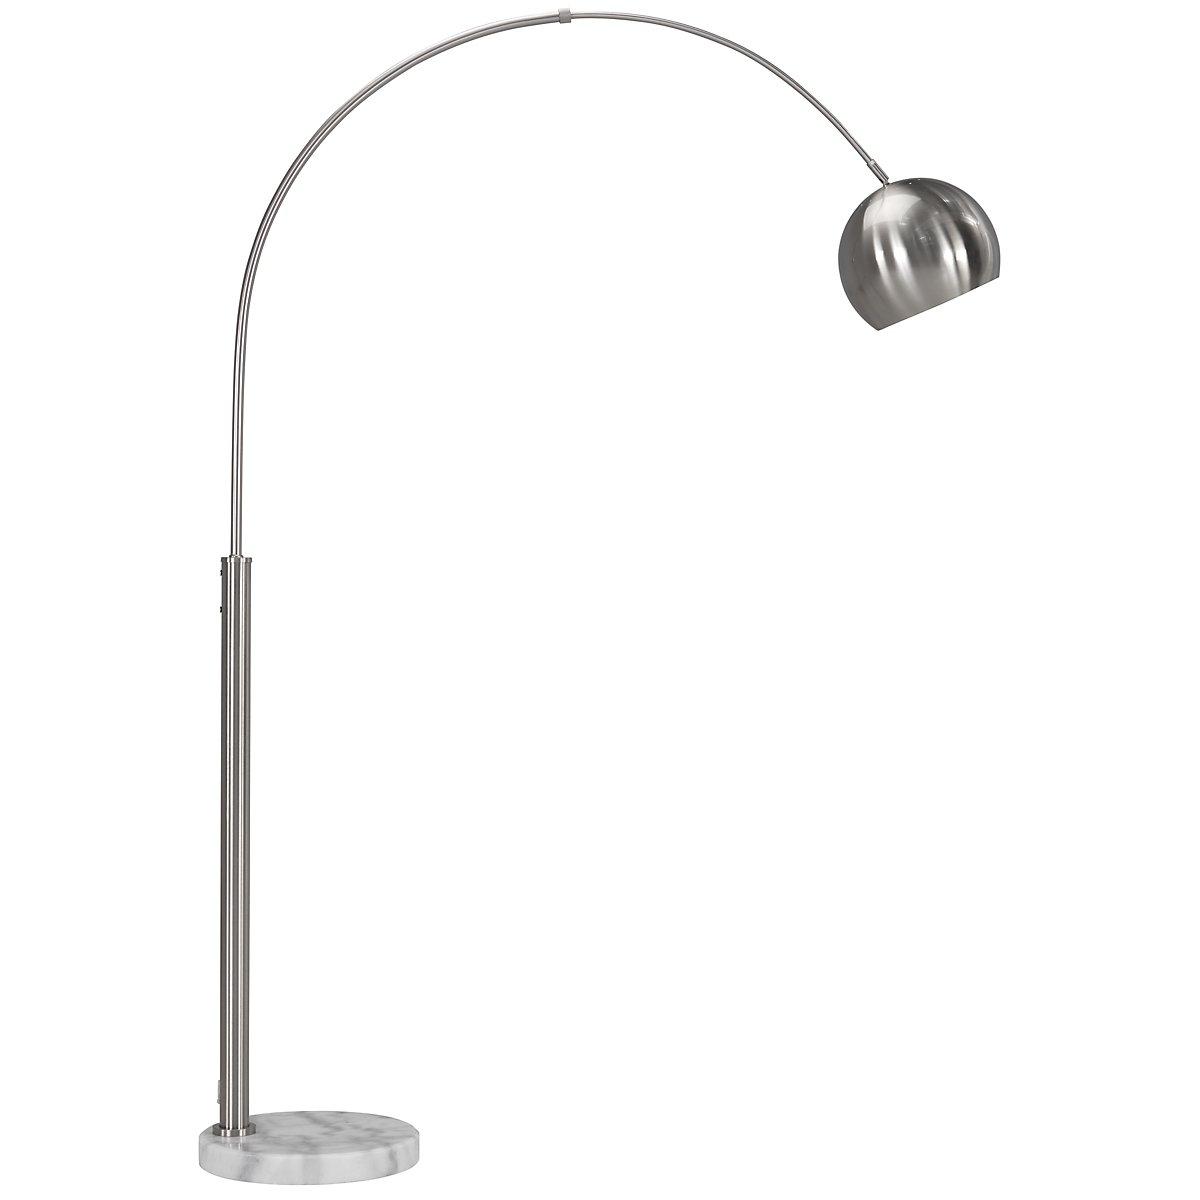 city furniture basque silver arc floor lamp. Black Bedroom Furniture Sets. Home Design Ideas